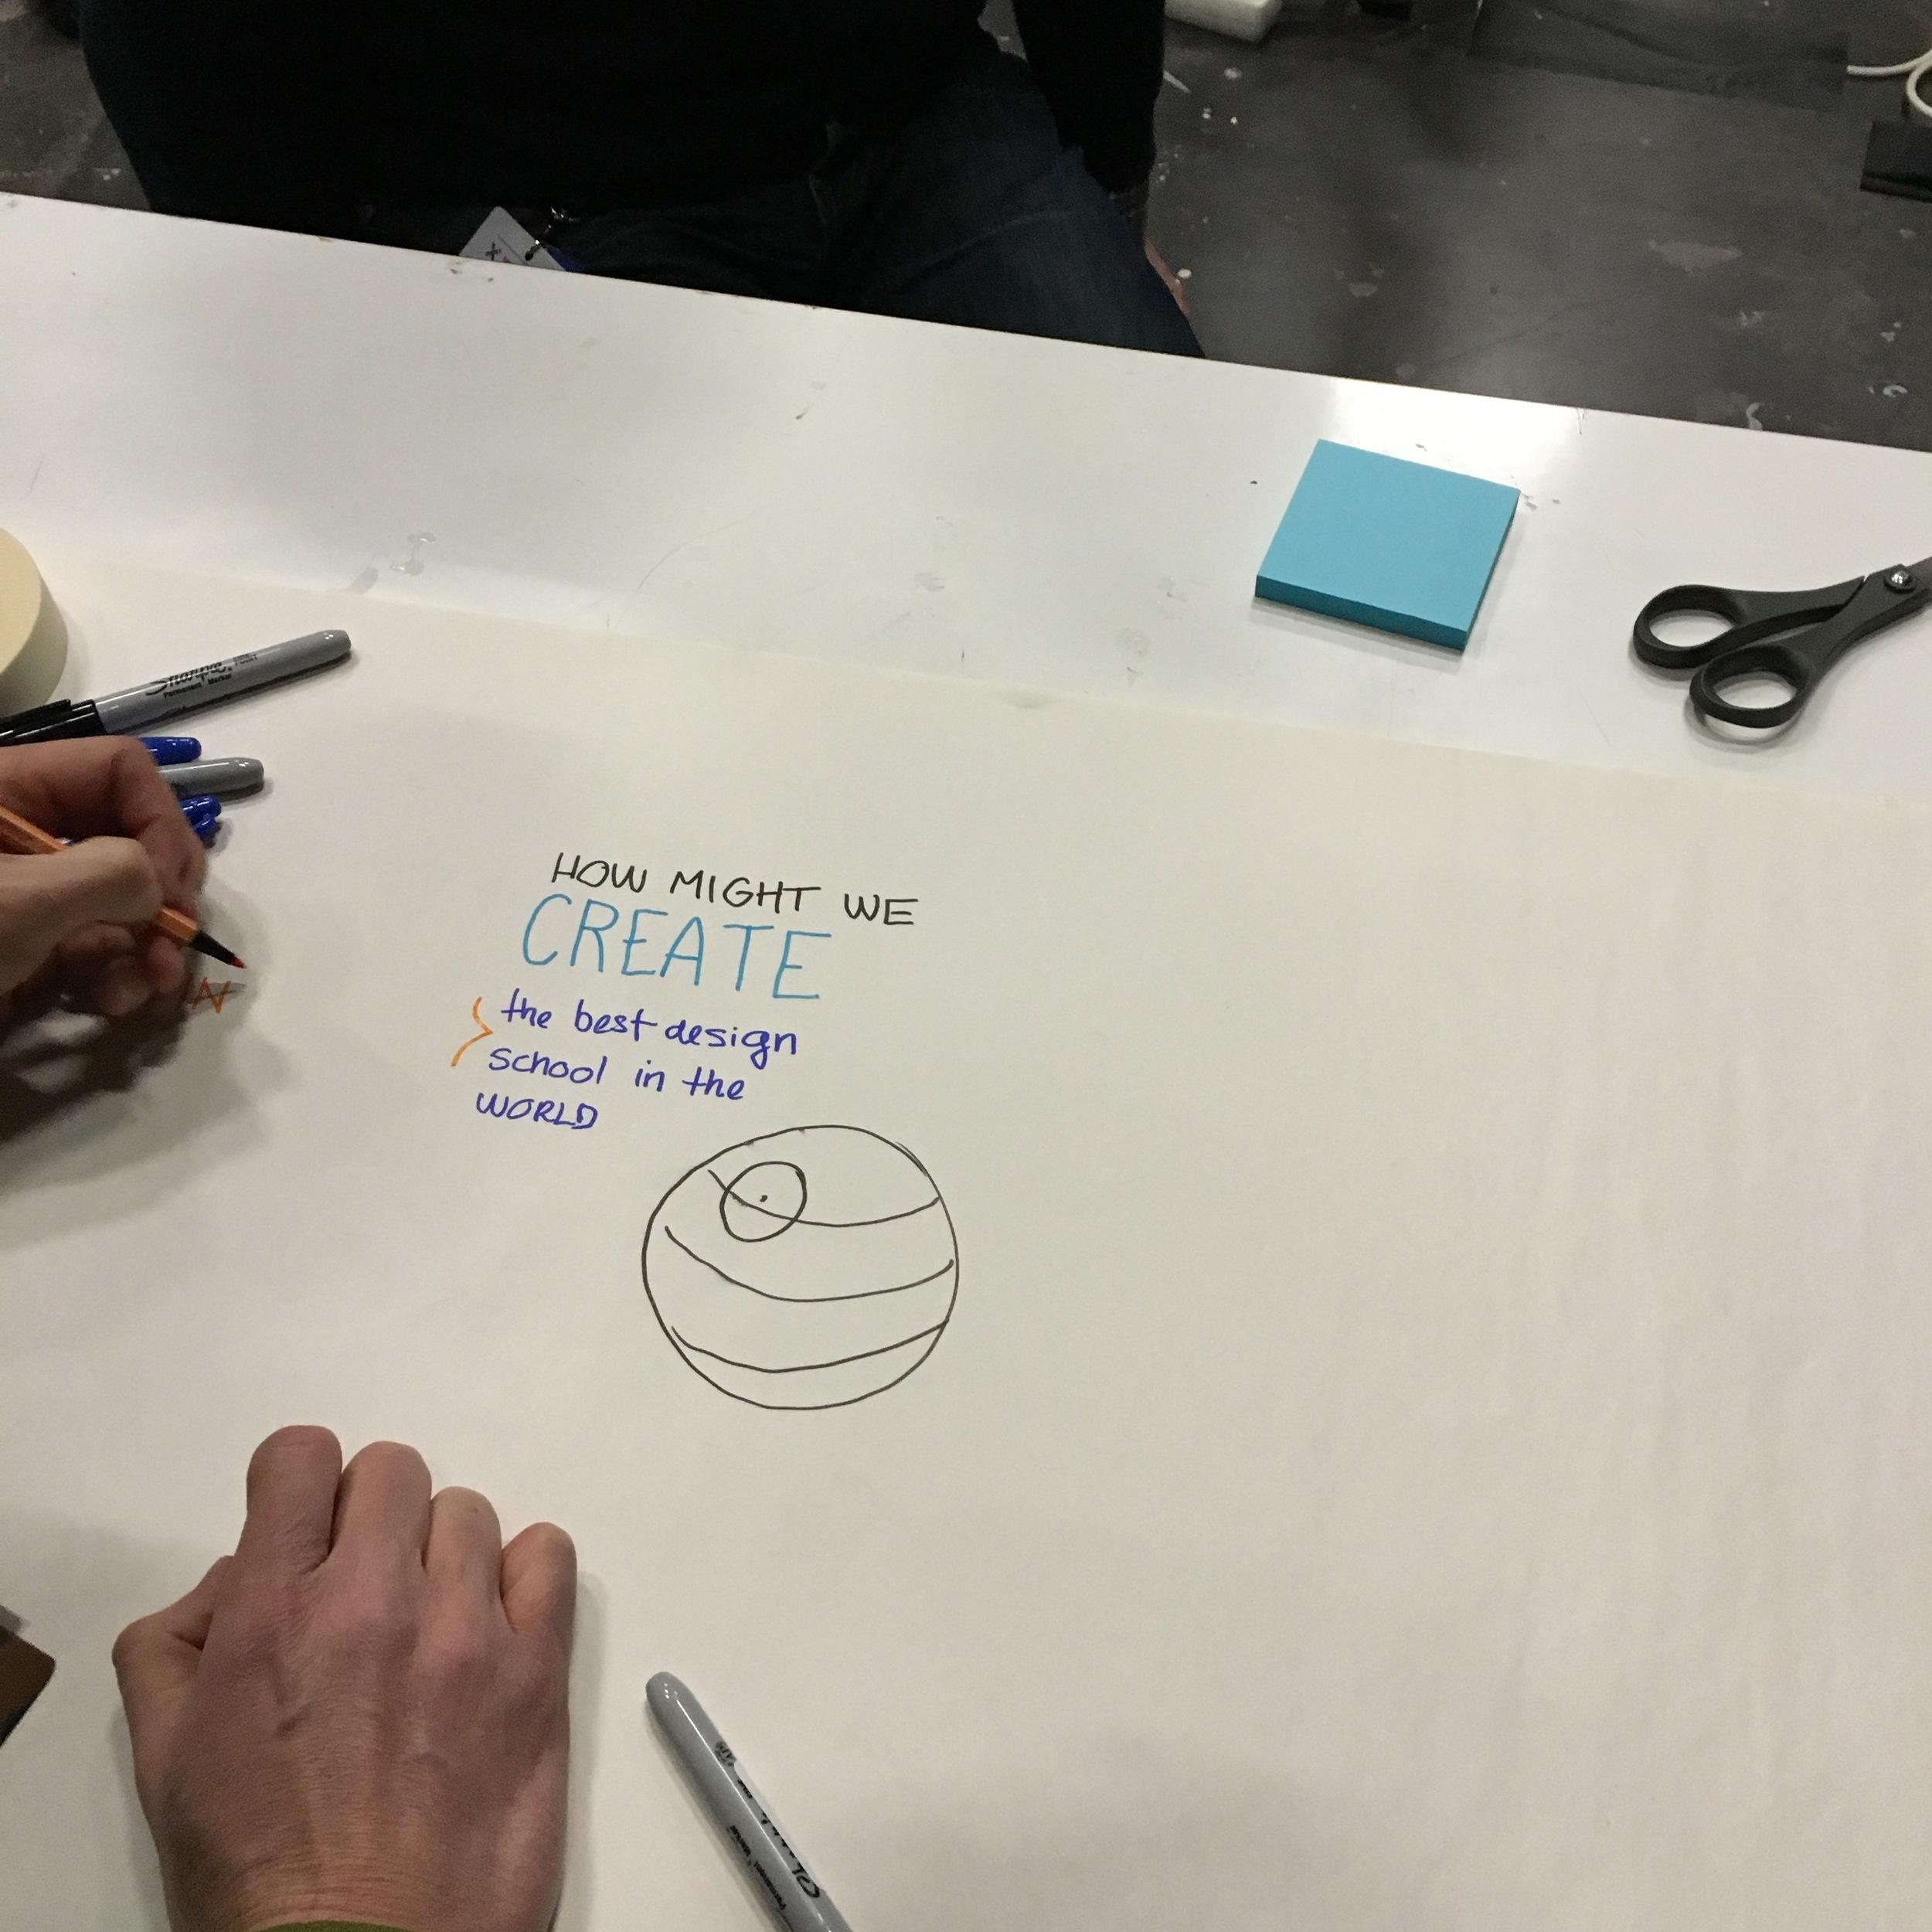 ixda_redjotter_design_education